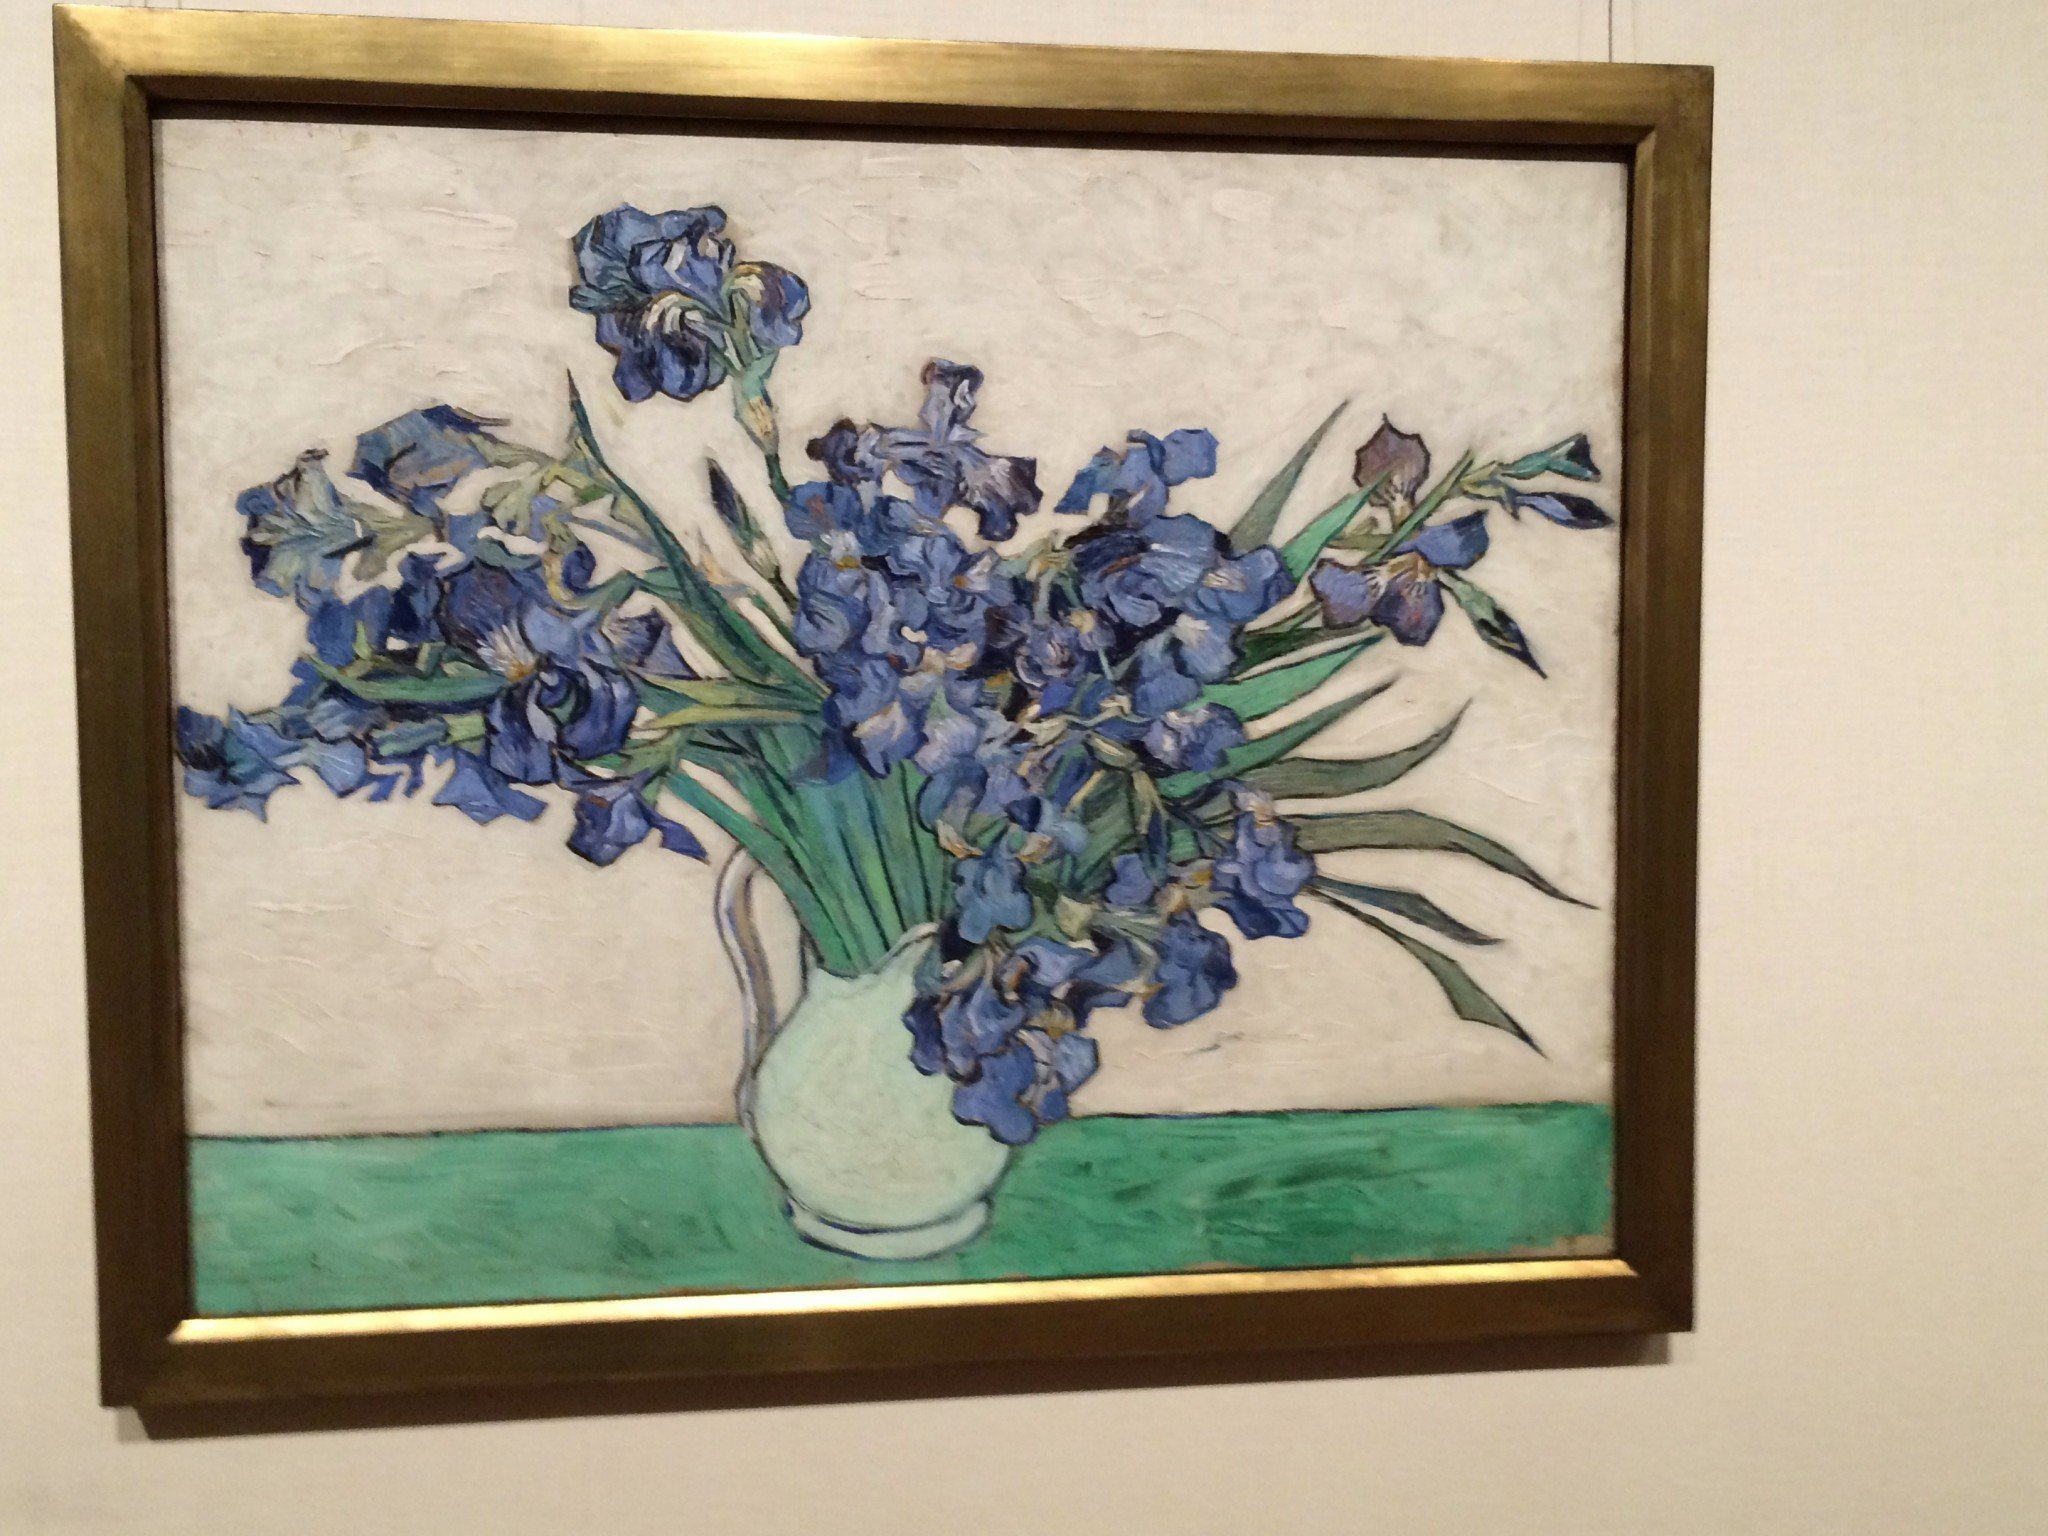 Art review van gogh irises and roses the metropolitan museum of van gogh irises 1890 oil on canvas 29 x 36 1 izmirmasajfo